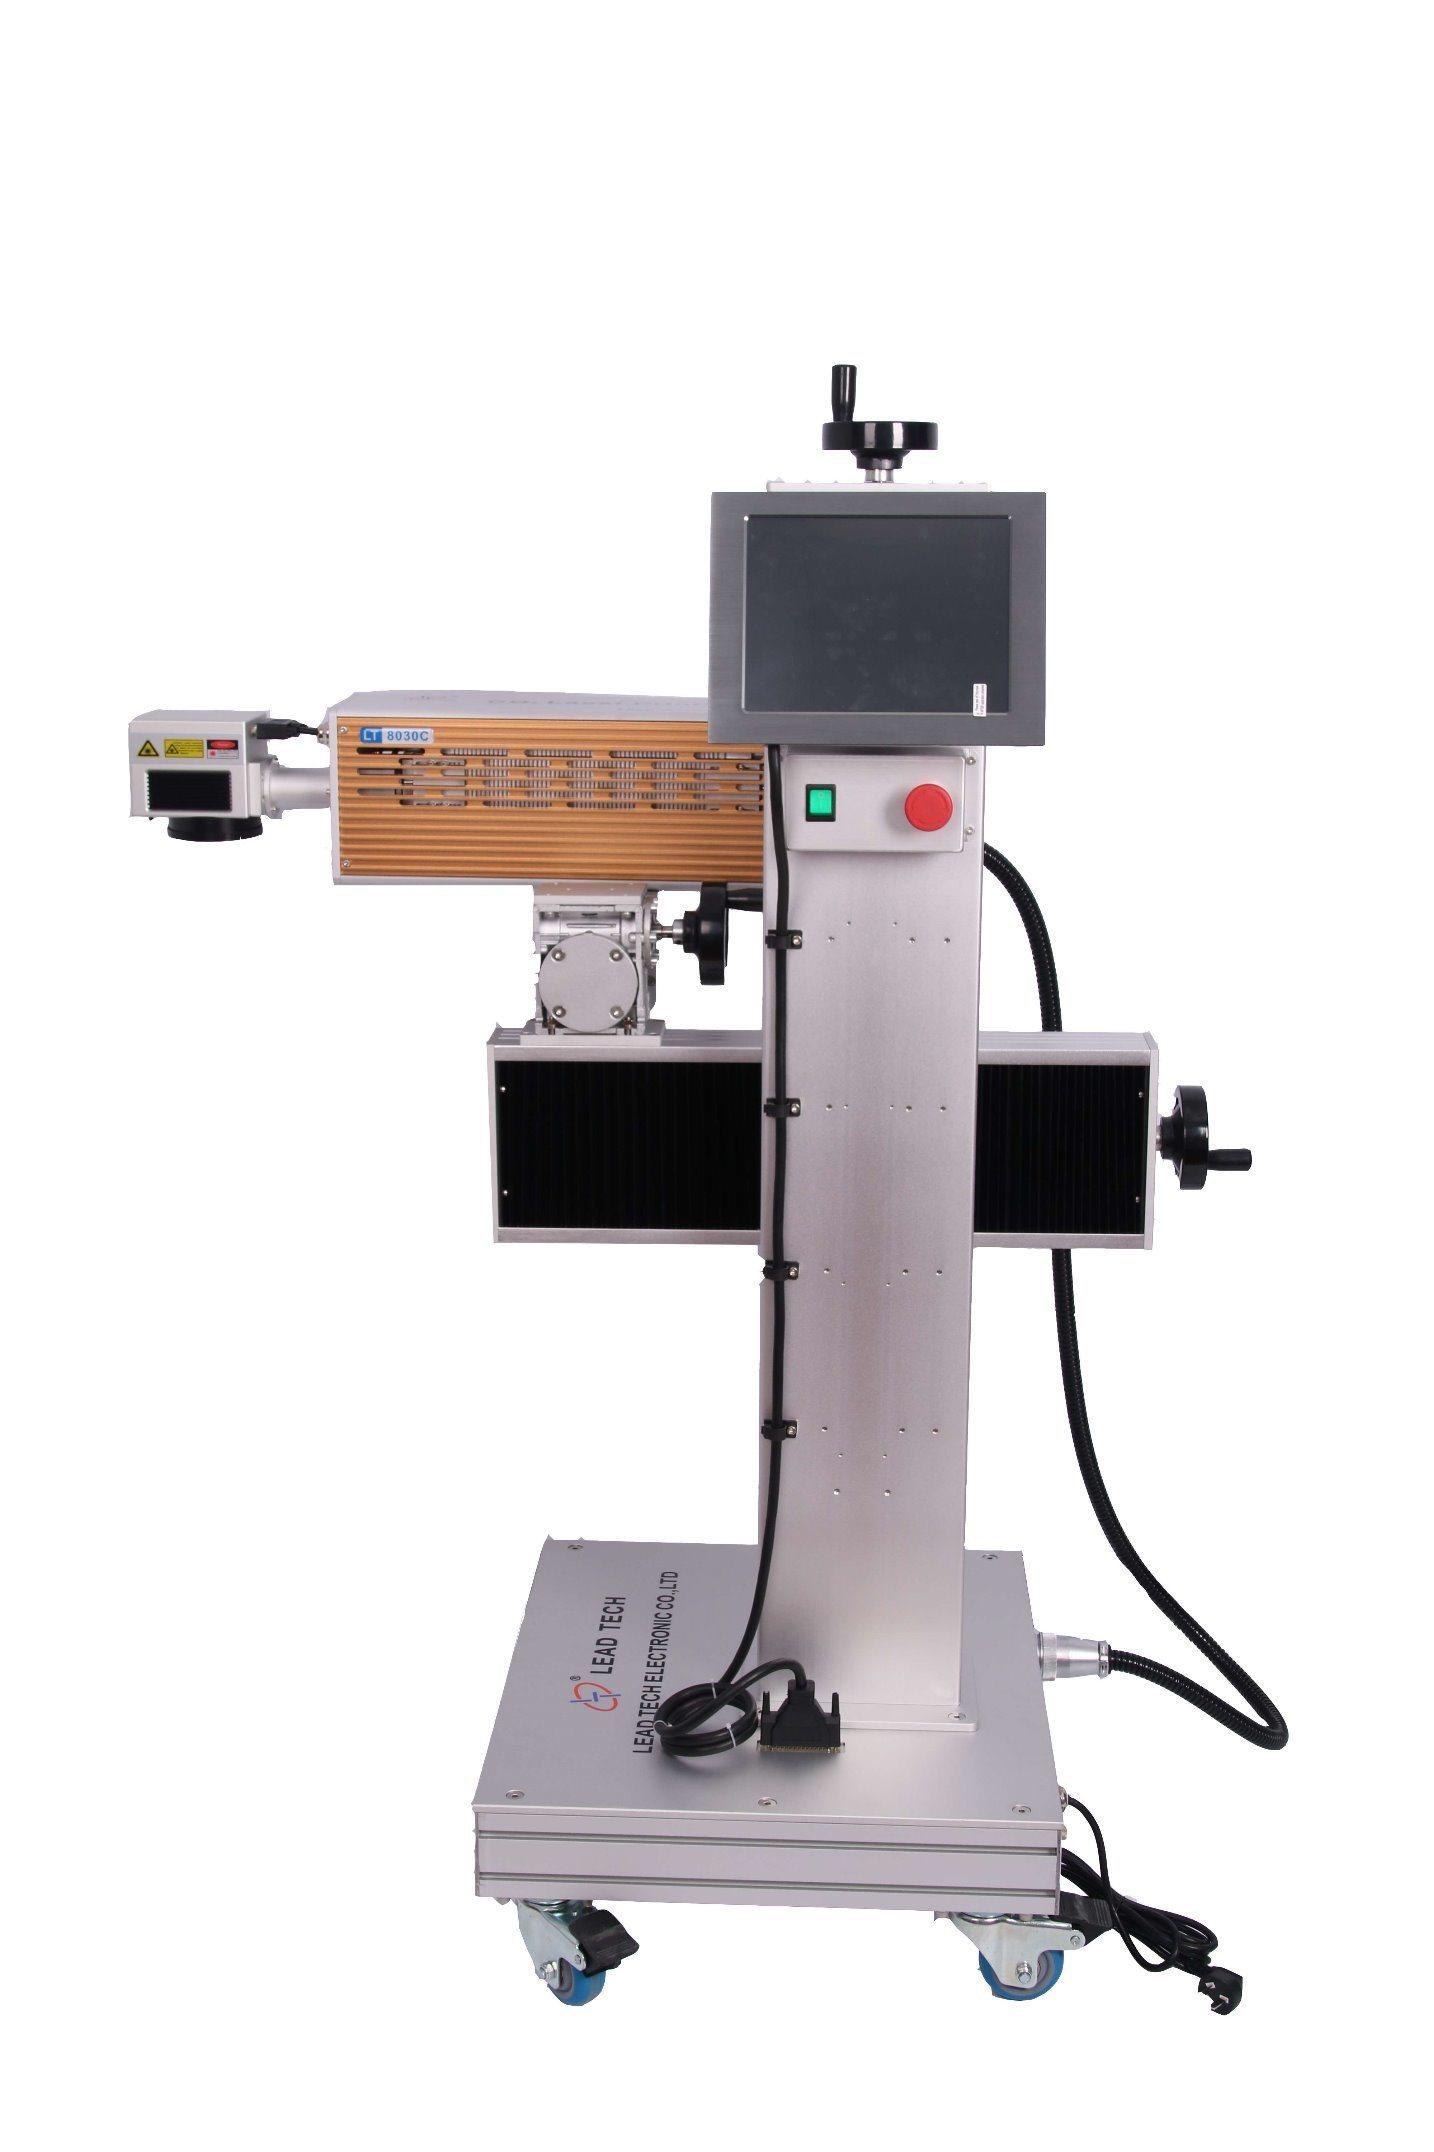 Lt8020c/Lt8030c CO2 20W/30W High Speed Fly Food Bottle Laser Printer